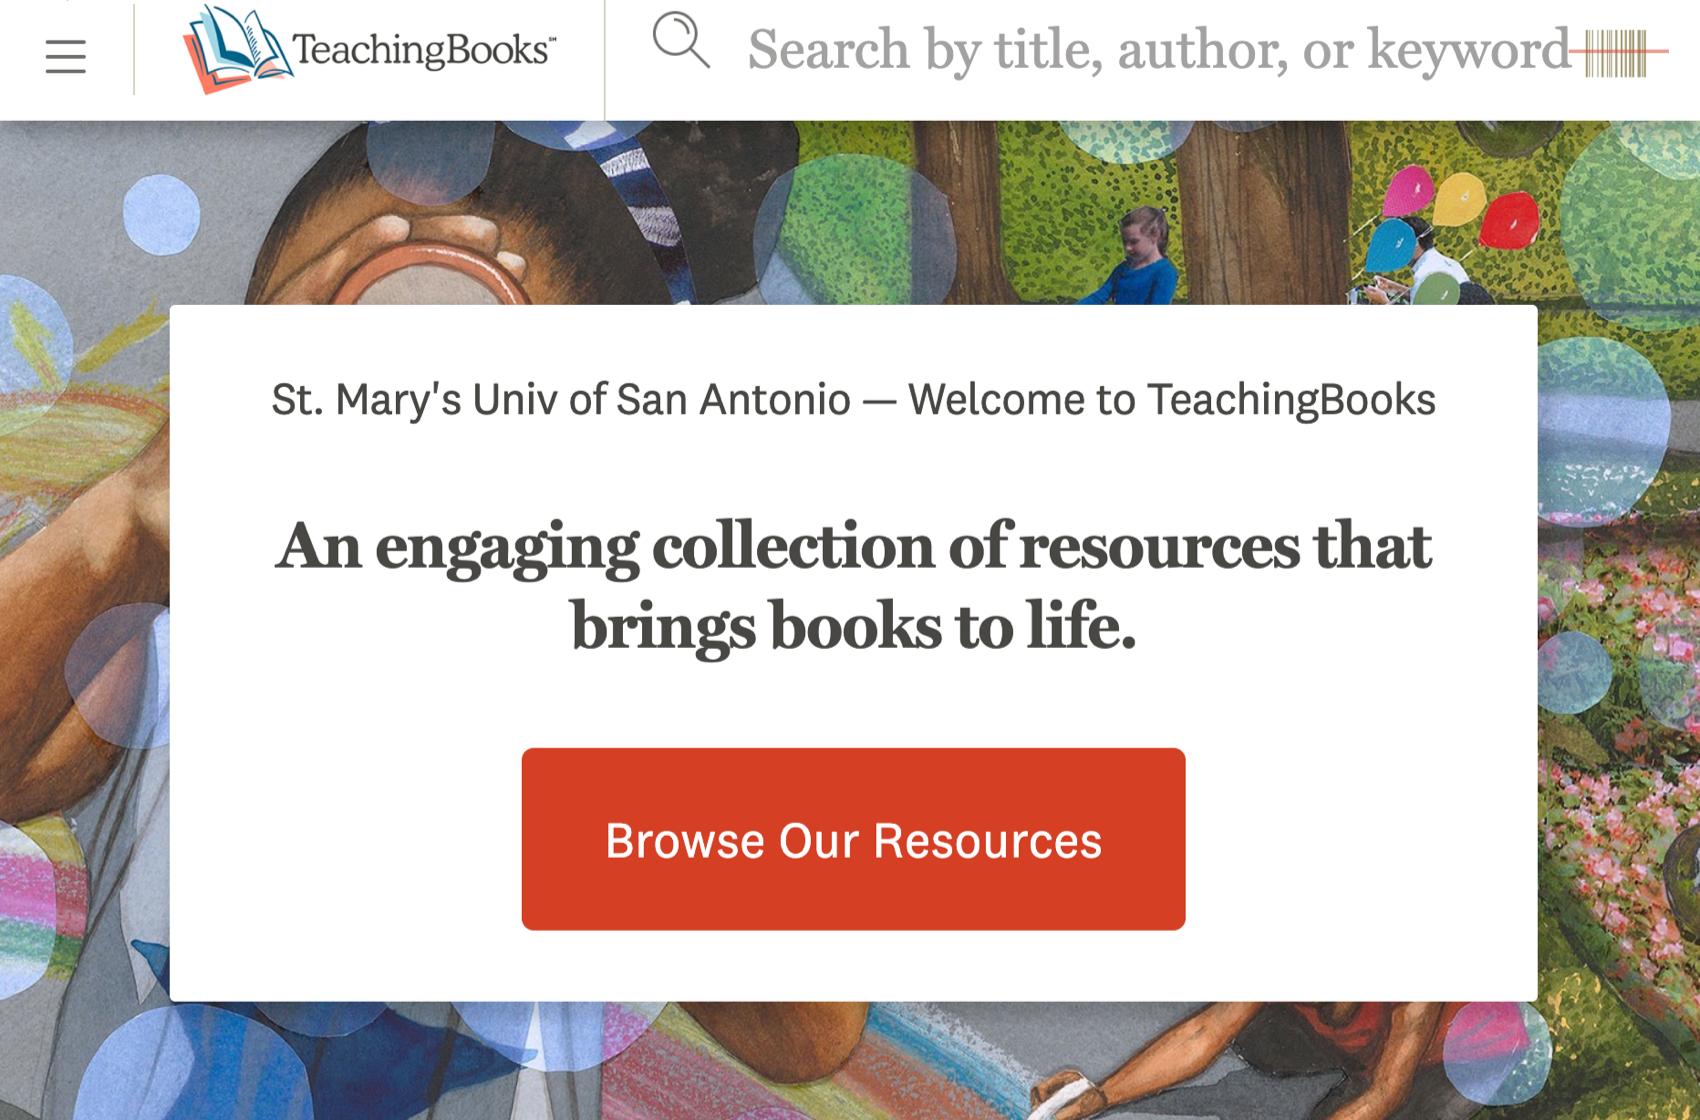 image of the TeachingBooks.net homepage